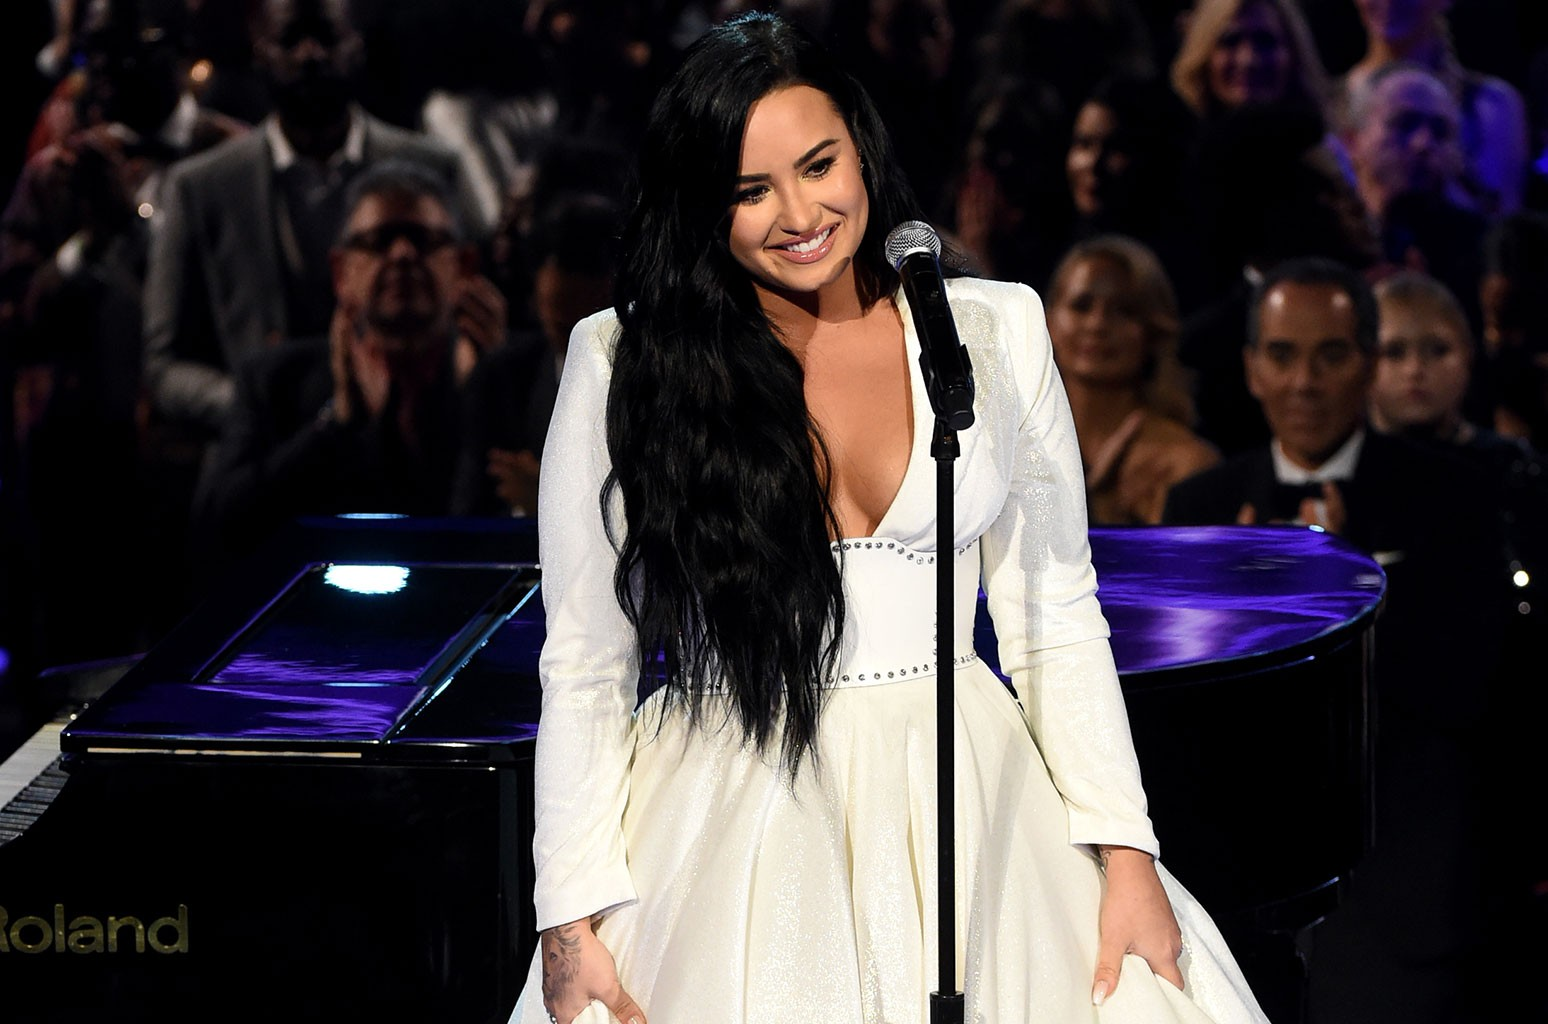 P Nk Sam Smith And Selena Gomez Praise Demi Lovato S Emotional 2020 Grammys Comeback Performance Billboard